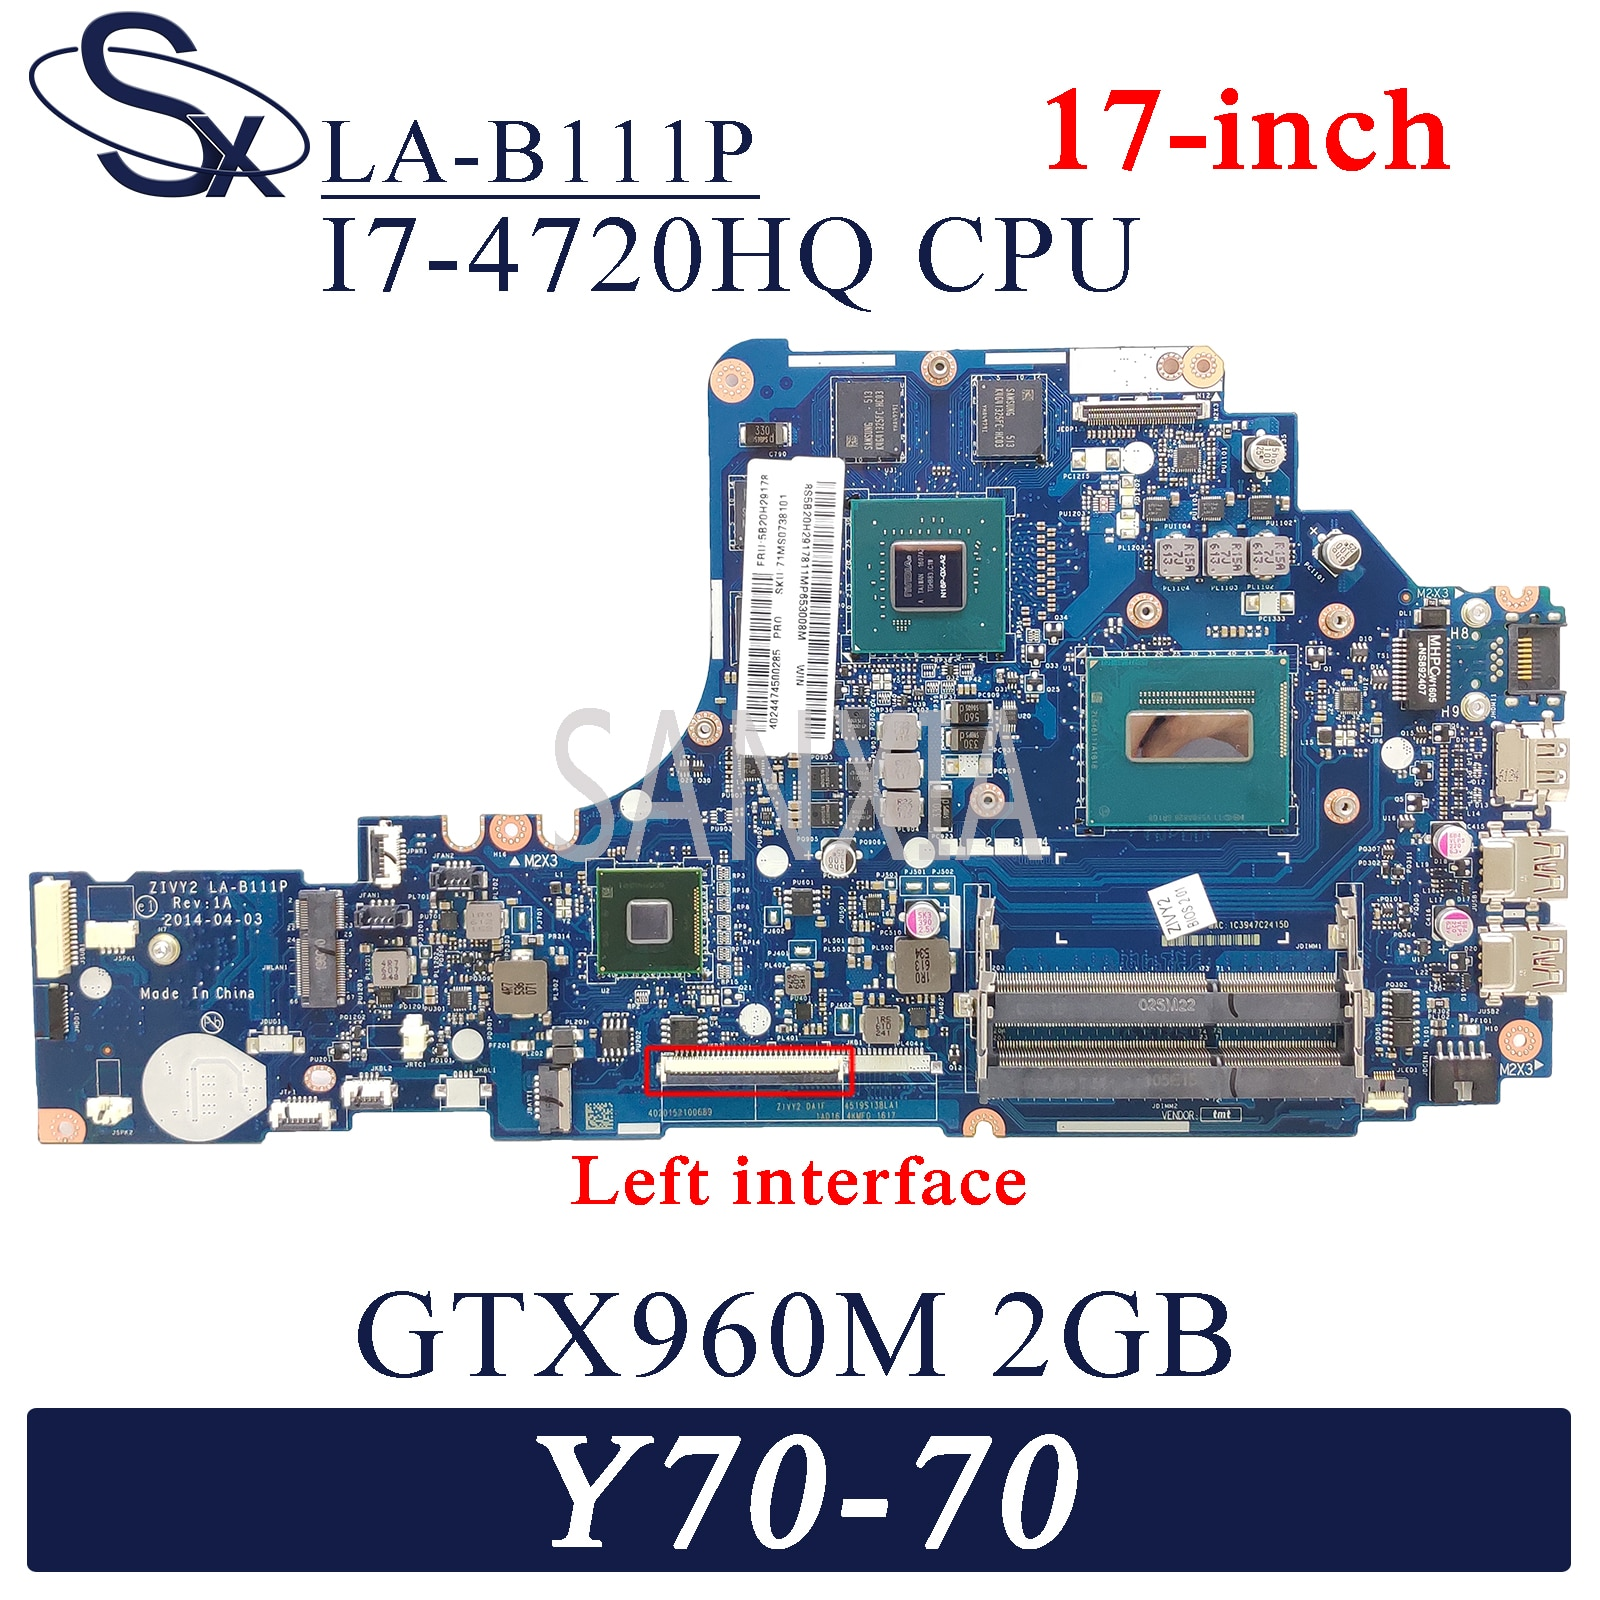 Placa base de ordenador portátil KEFU LA-B111P para Lenovo Y70-70 placa base original de 17 pulgadas I7-4720HQ/4710HQ GTX960M-2GB